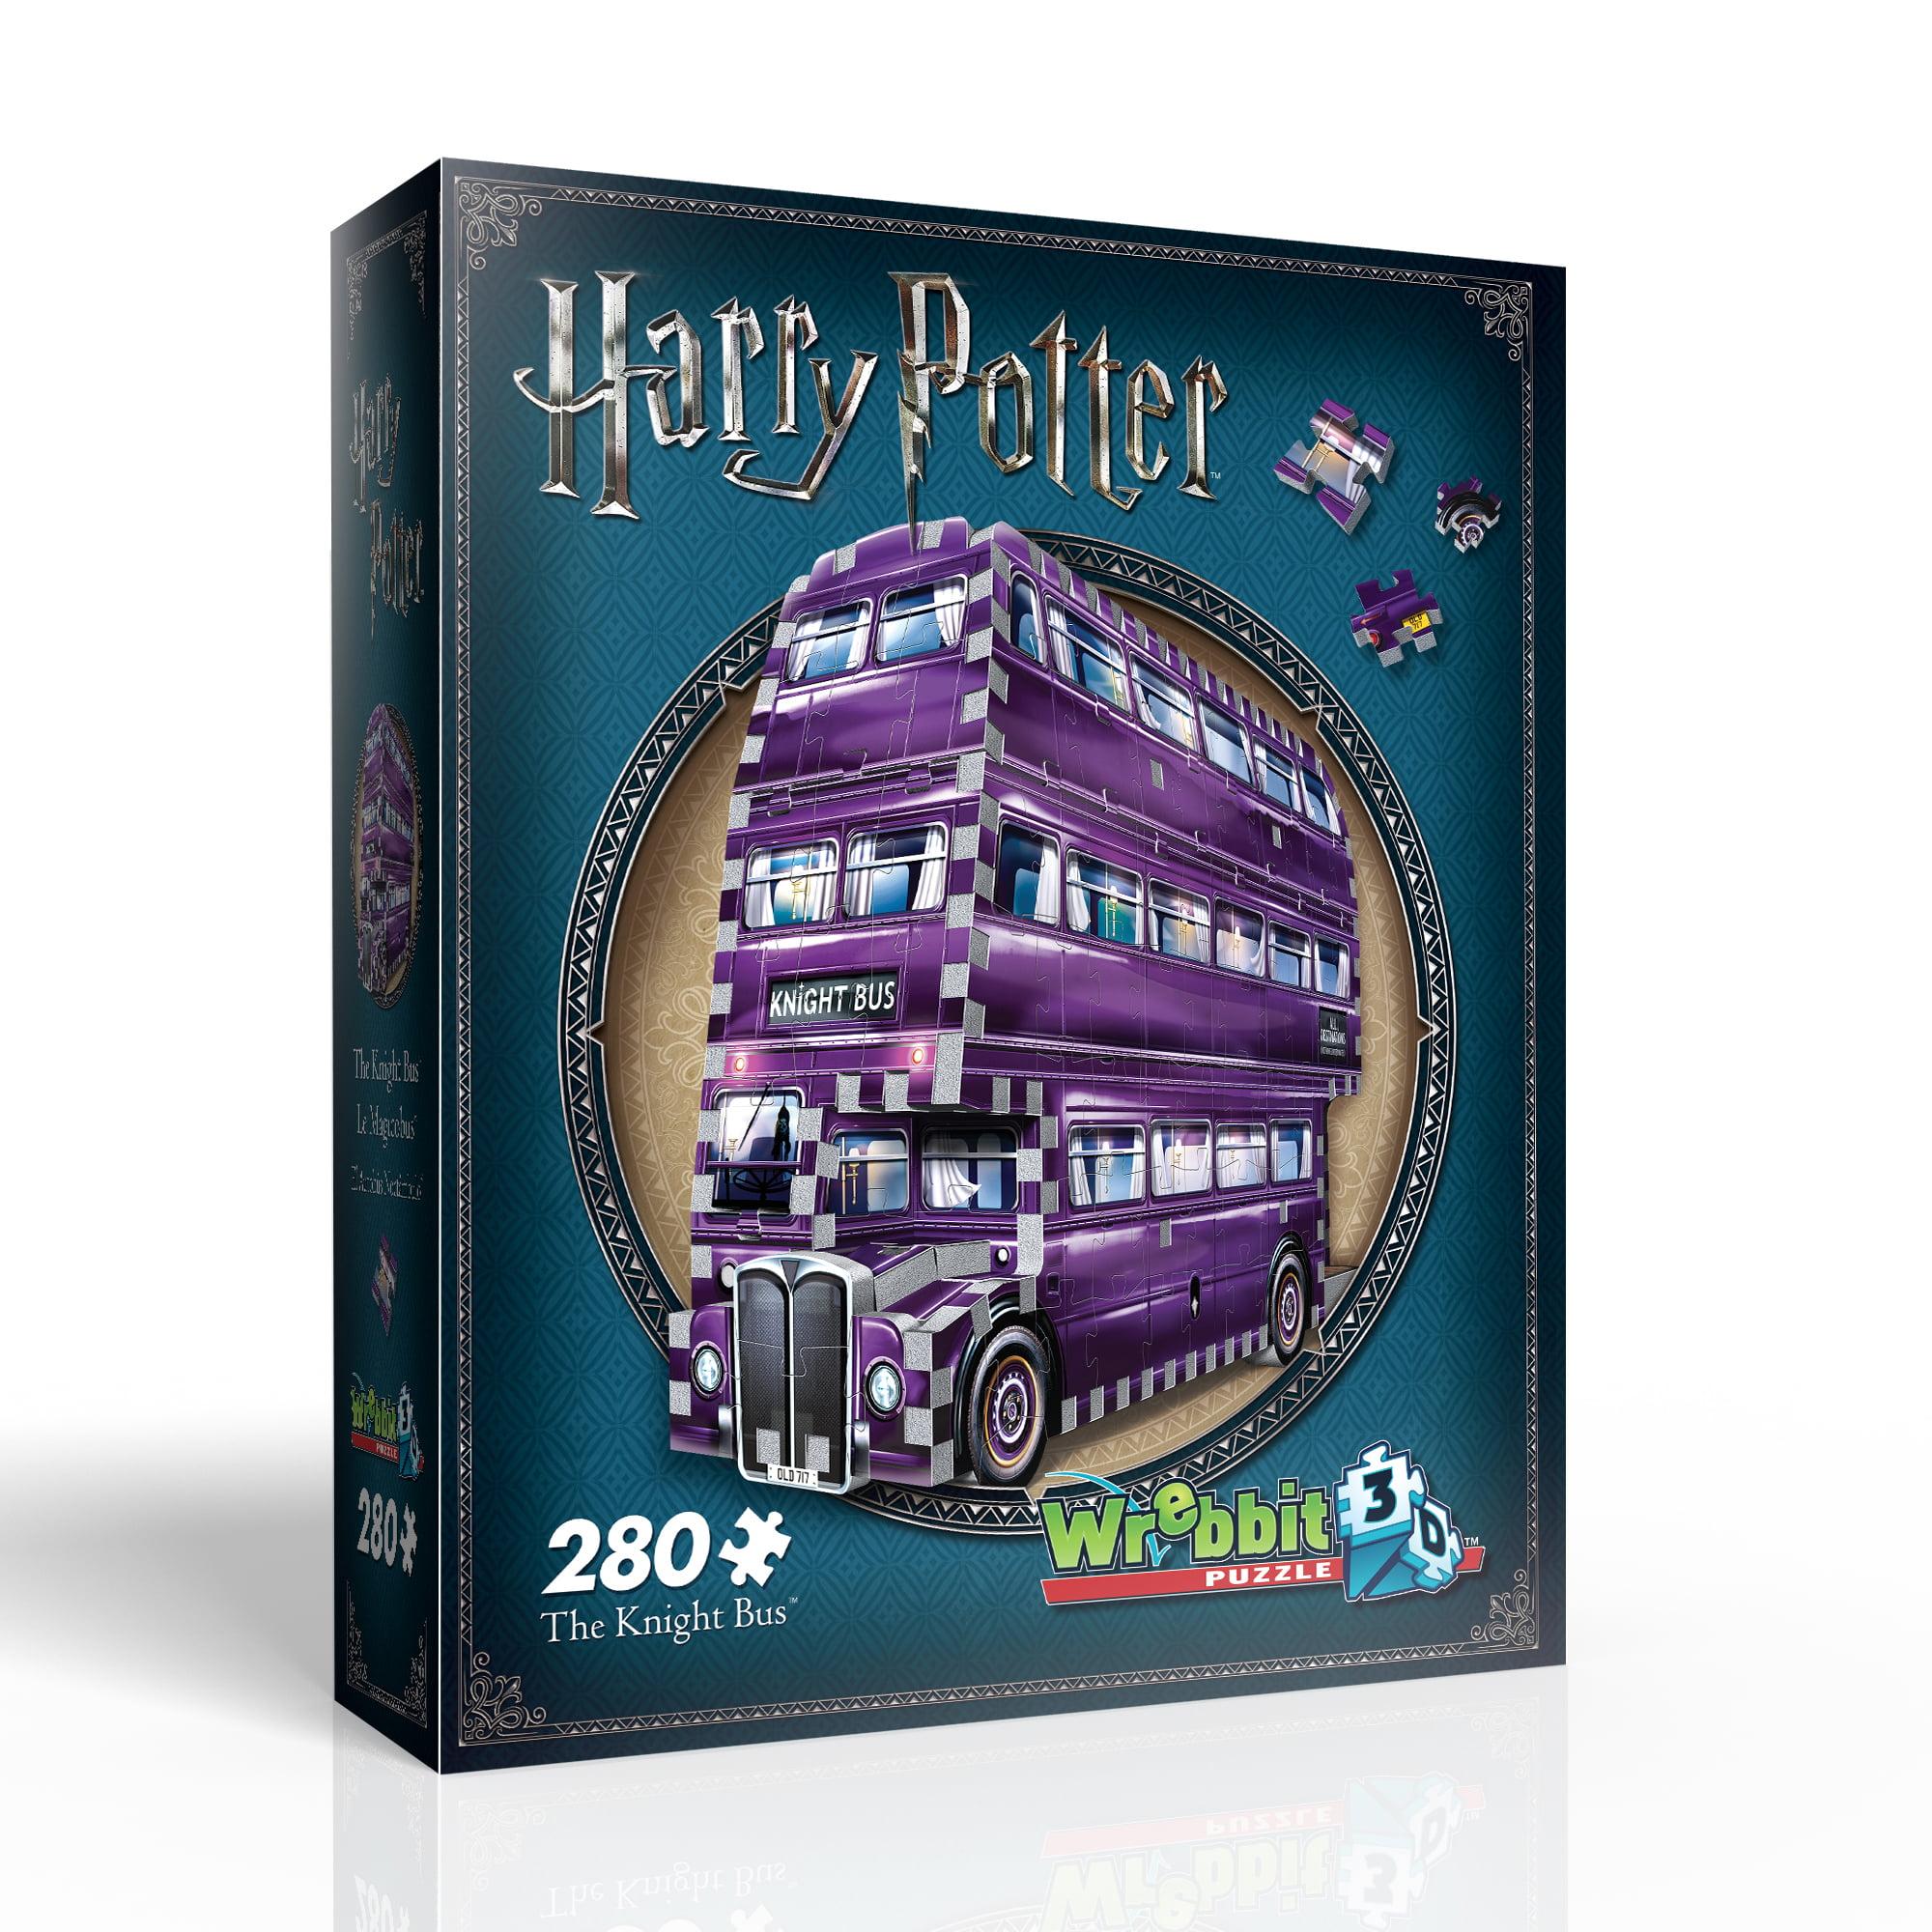 Wrebbit3D Puzzle The Knight Bus by Wrebbit Puzzles, Inc.